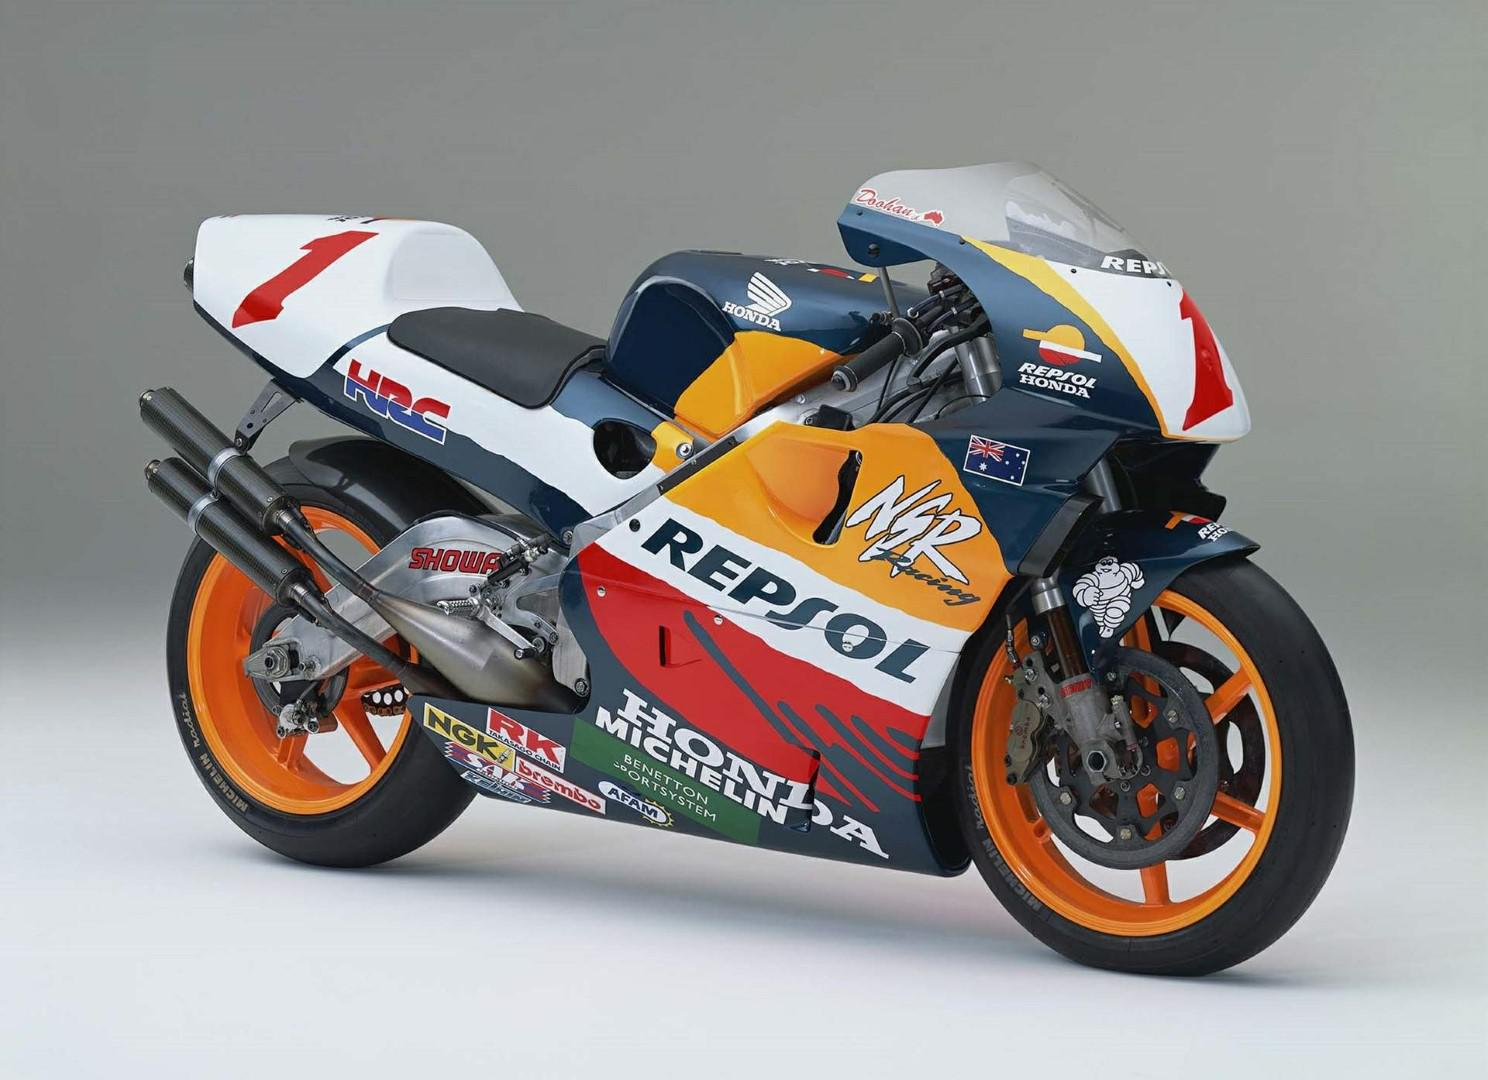 moto-gp-honda-evolution-de-la-puissance-1408-6.jpg